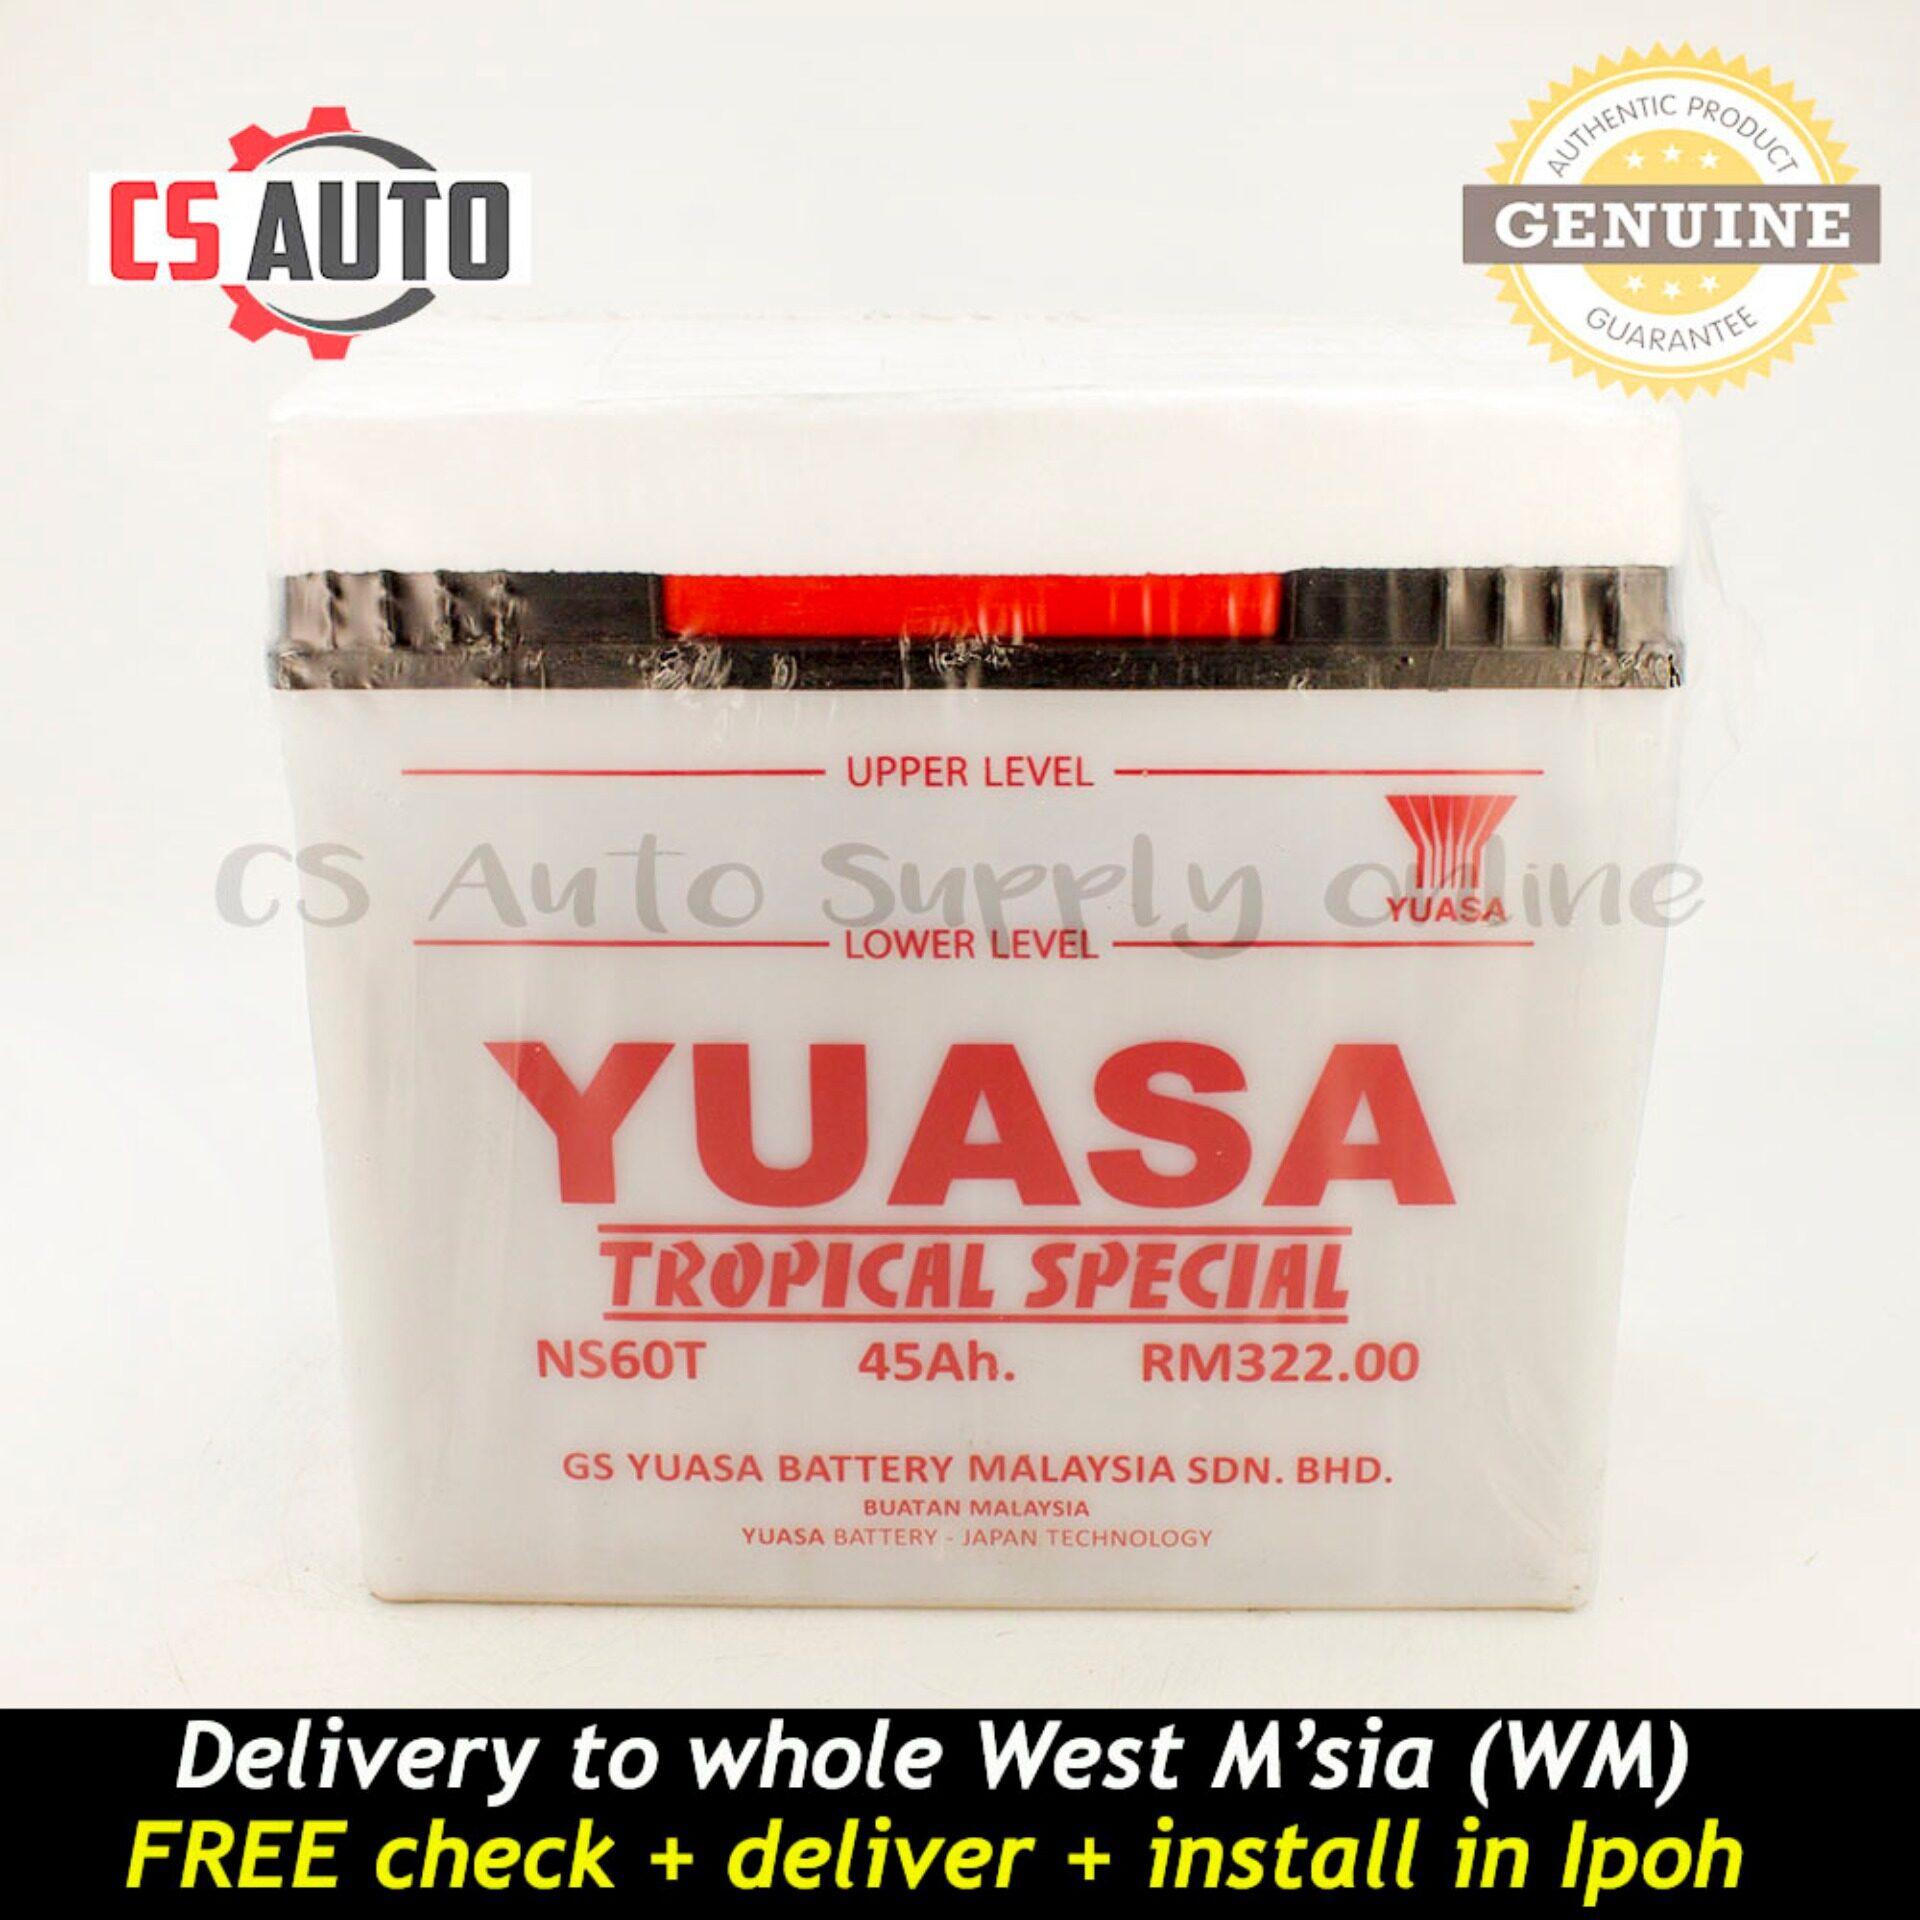 Yuasa NS60L NS60 L Tropical Battery Wet for Proton Iswara, Waja, Toyota Vios, Altis, RAV, Honda CR-V, Honda Civic Ipoh area (100% Original)